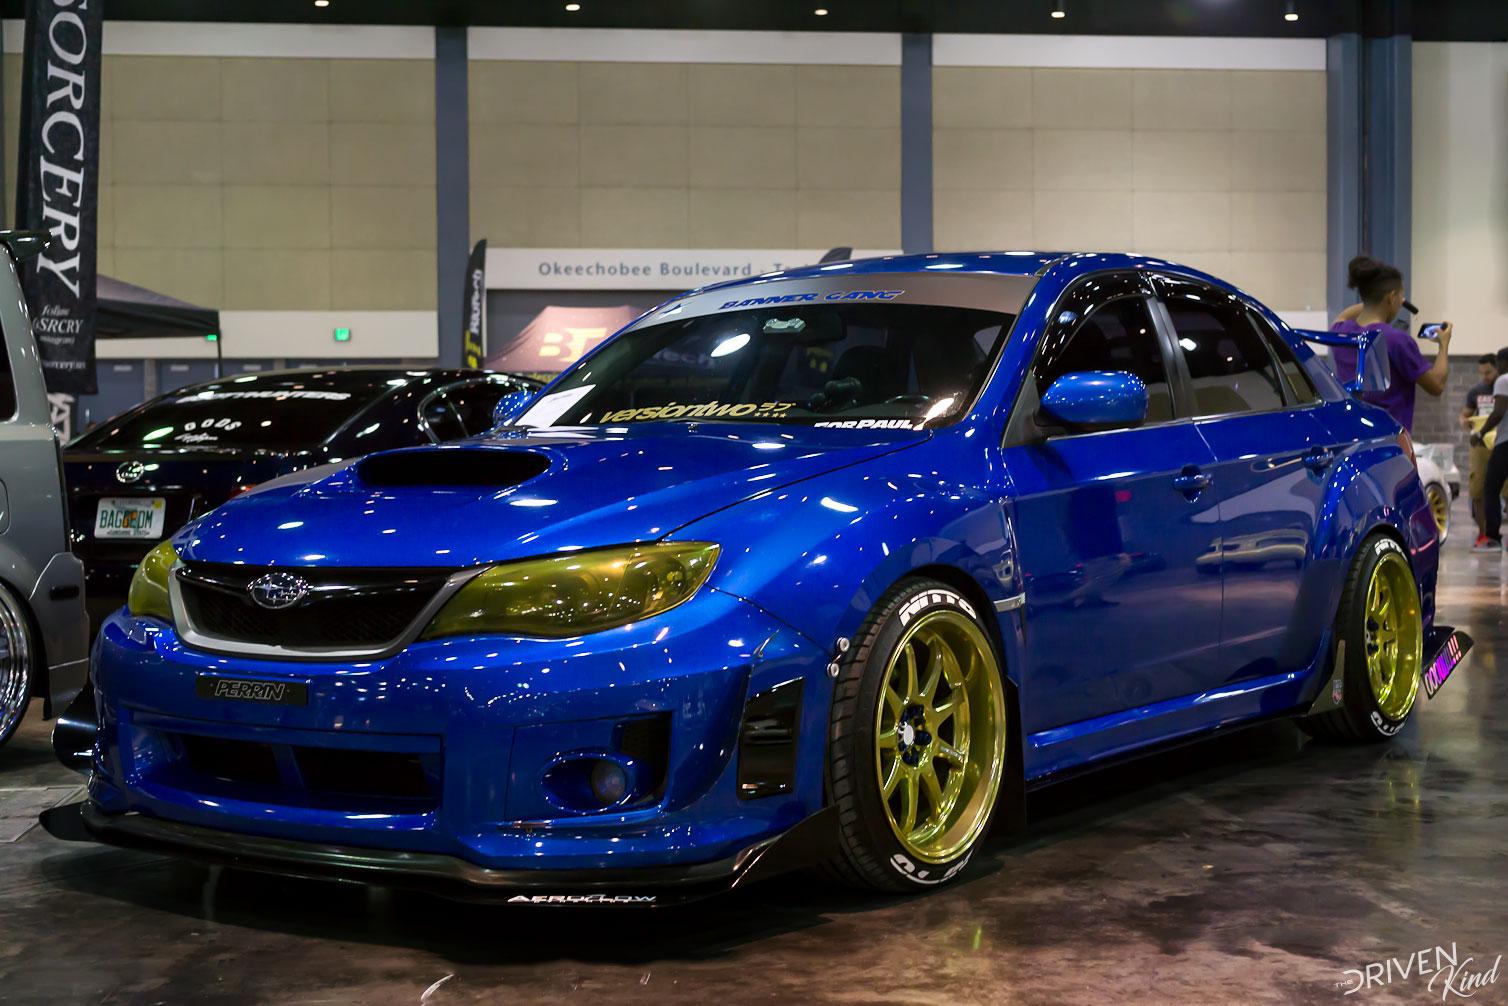 Subaru STI STANCENATION FLORIDA PALM BEACH CONVENTION CENTER 2017 Pt. 2 The Driven Kind Coverage